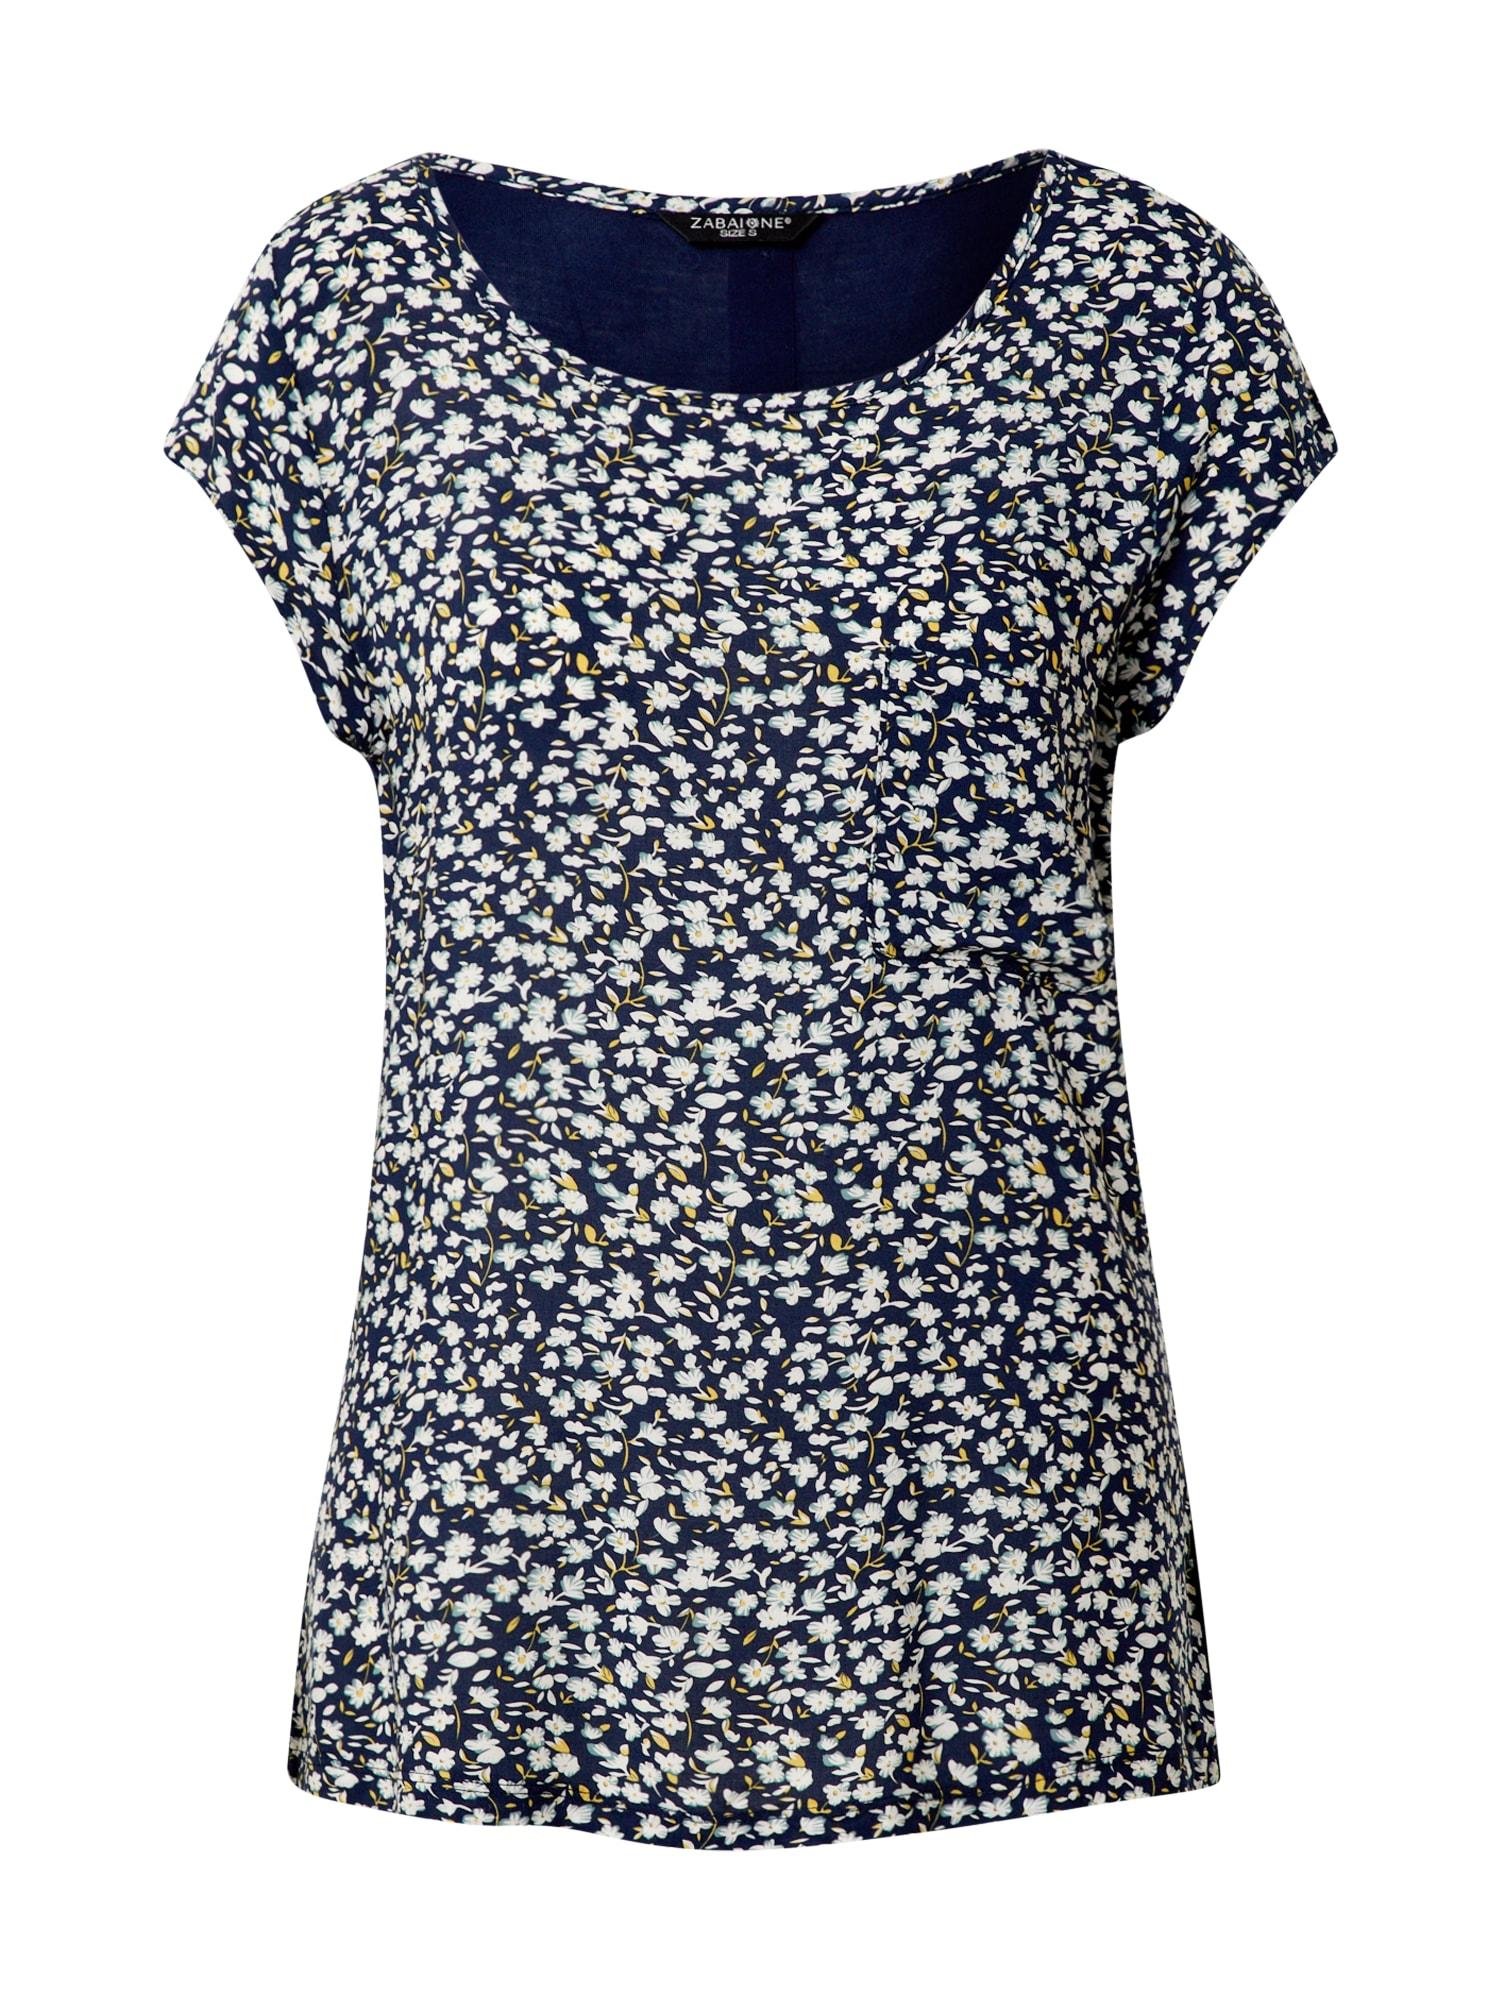 ZABAIONE Tričko 'Ida'  námořnická modř / mix barev